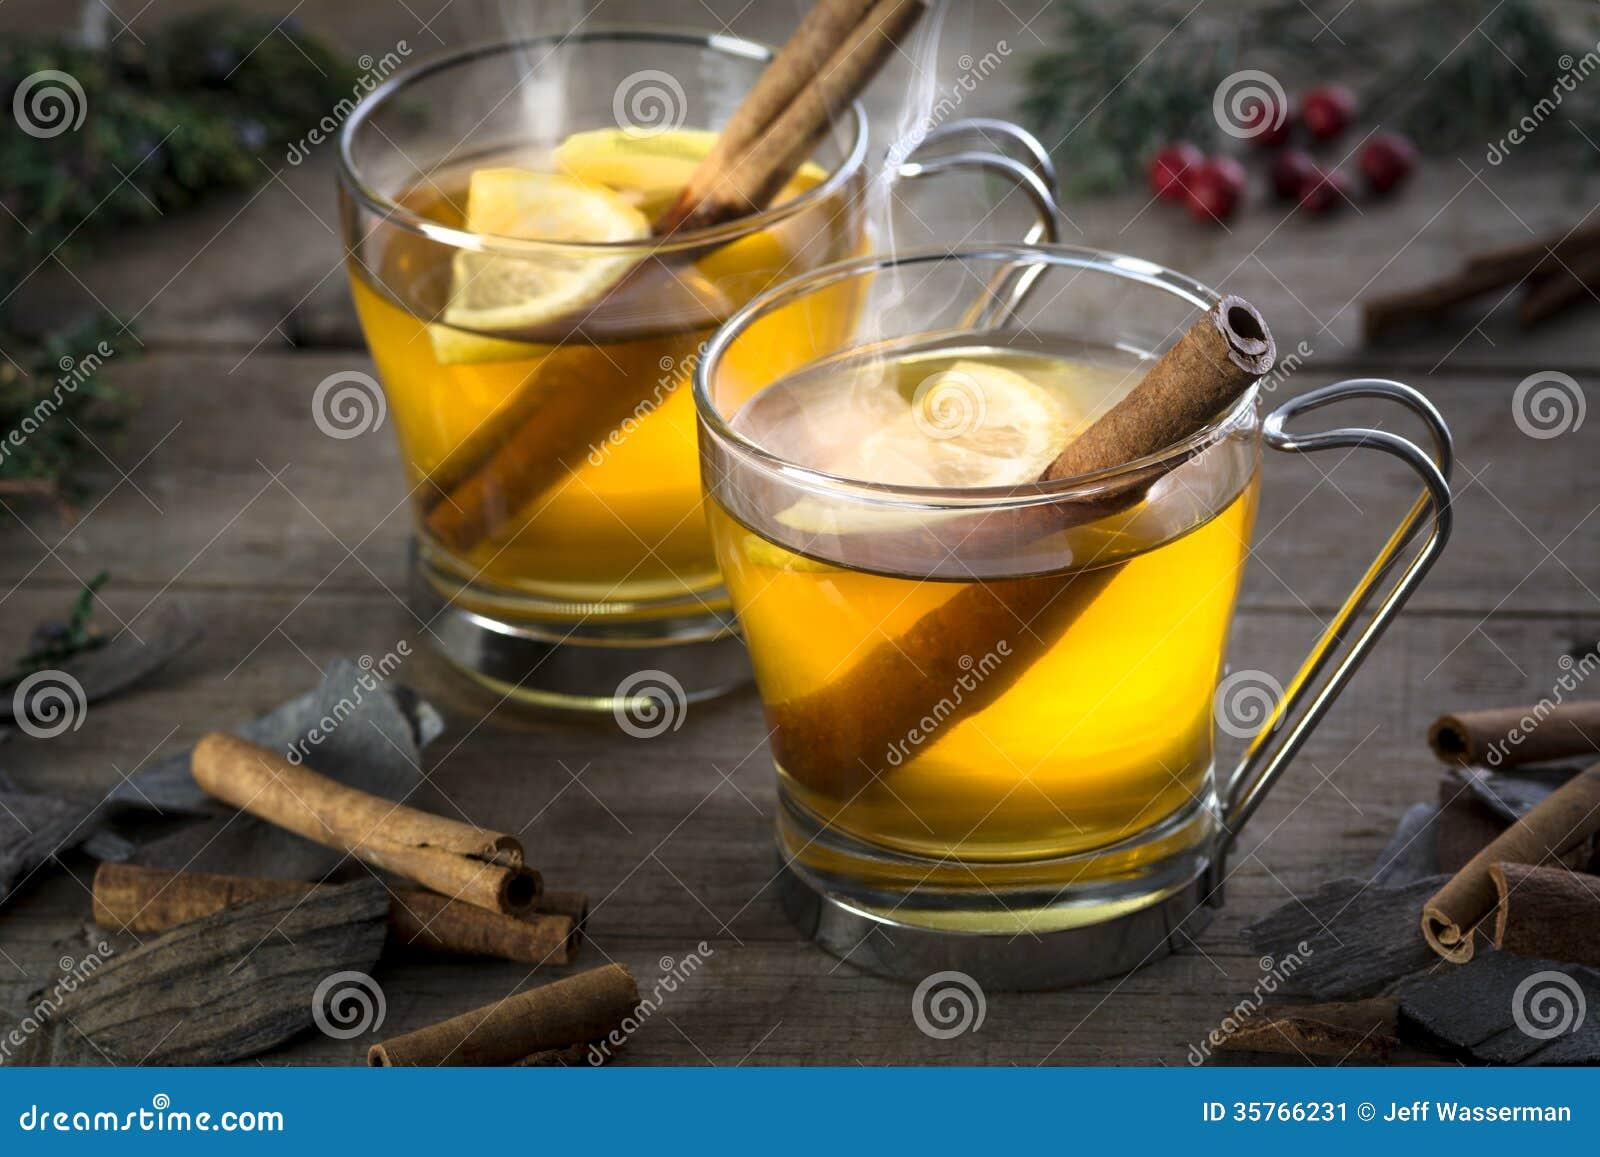 Apple Brandy Hot Toddy Recipes — Dishmaps